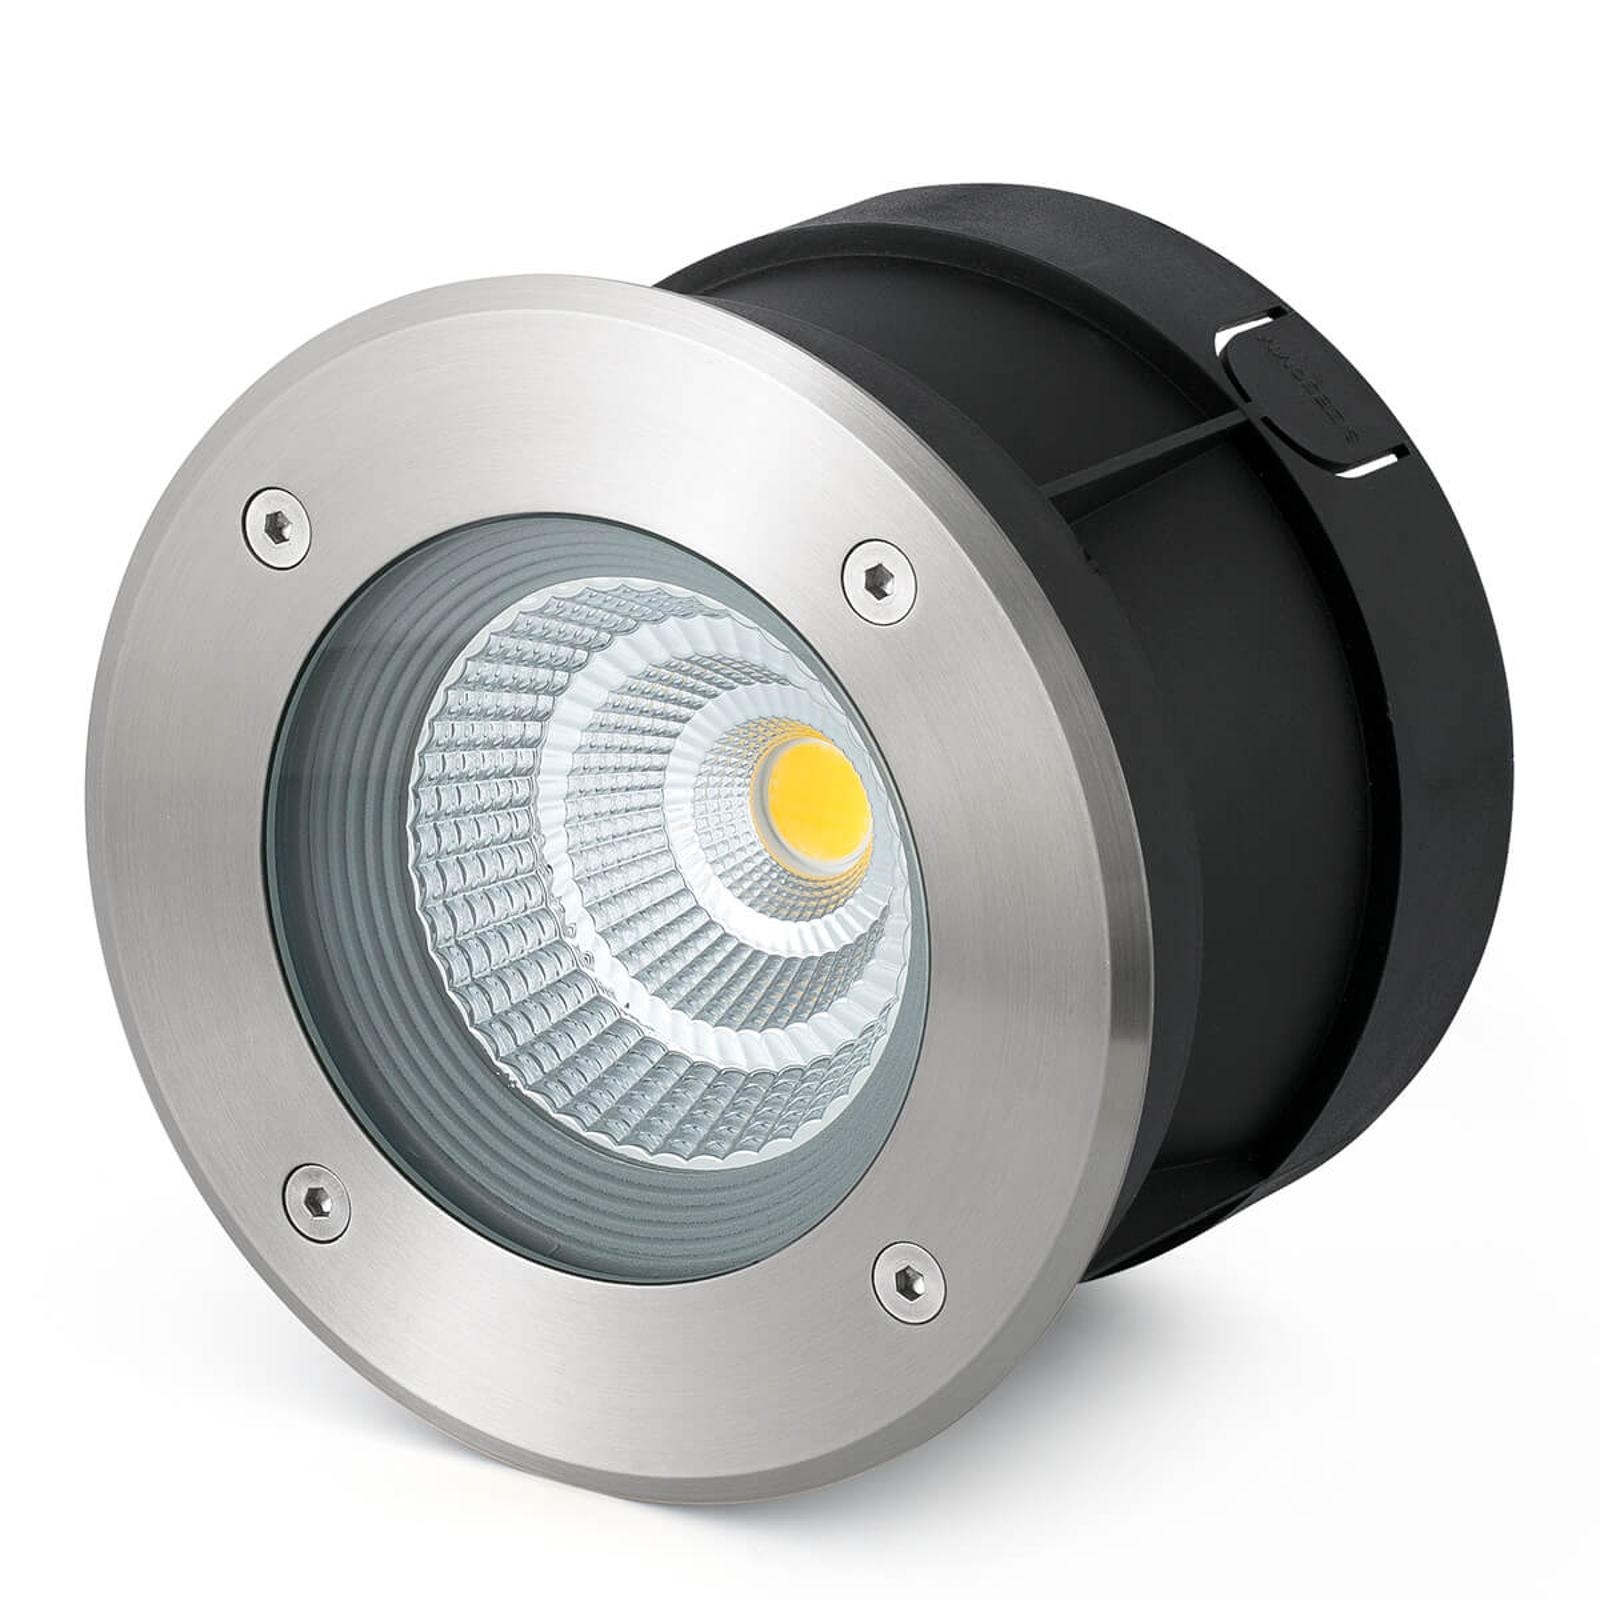 Suria-12 LED-bakkespot, IP67